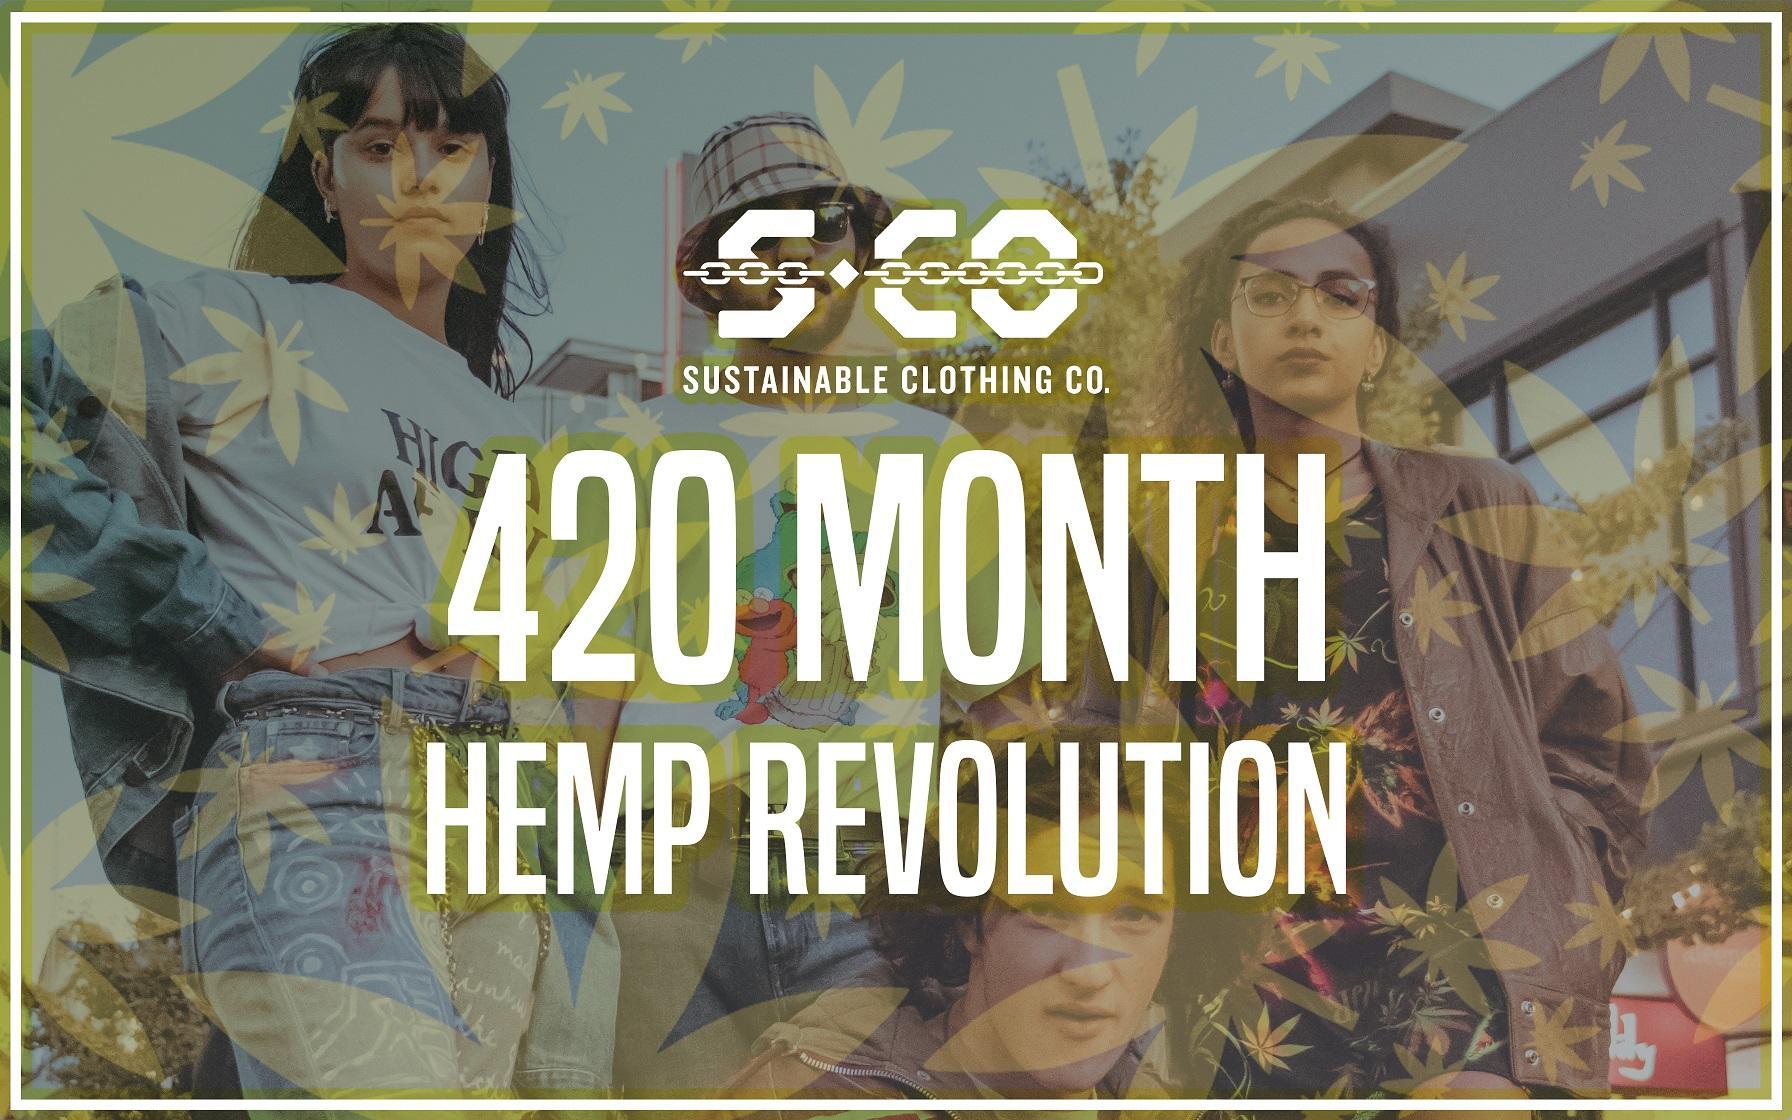 420 Hemp Fashion Revolution